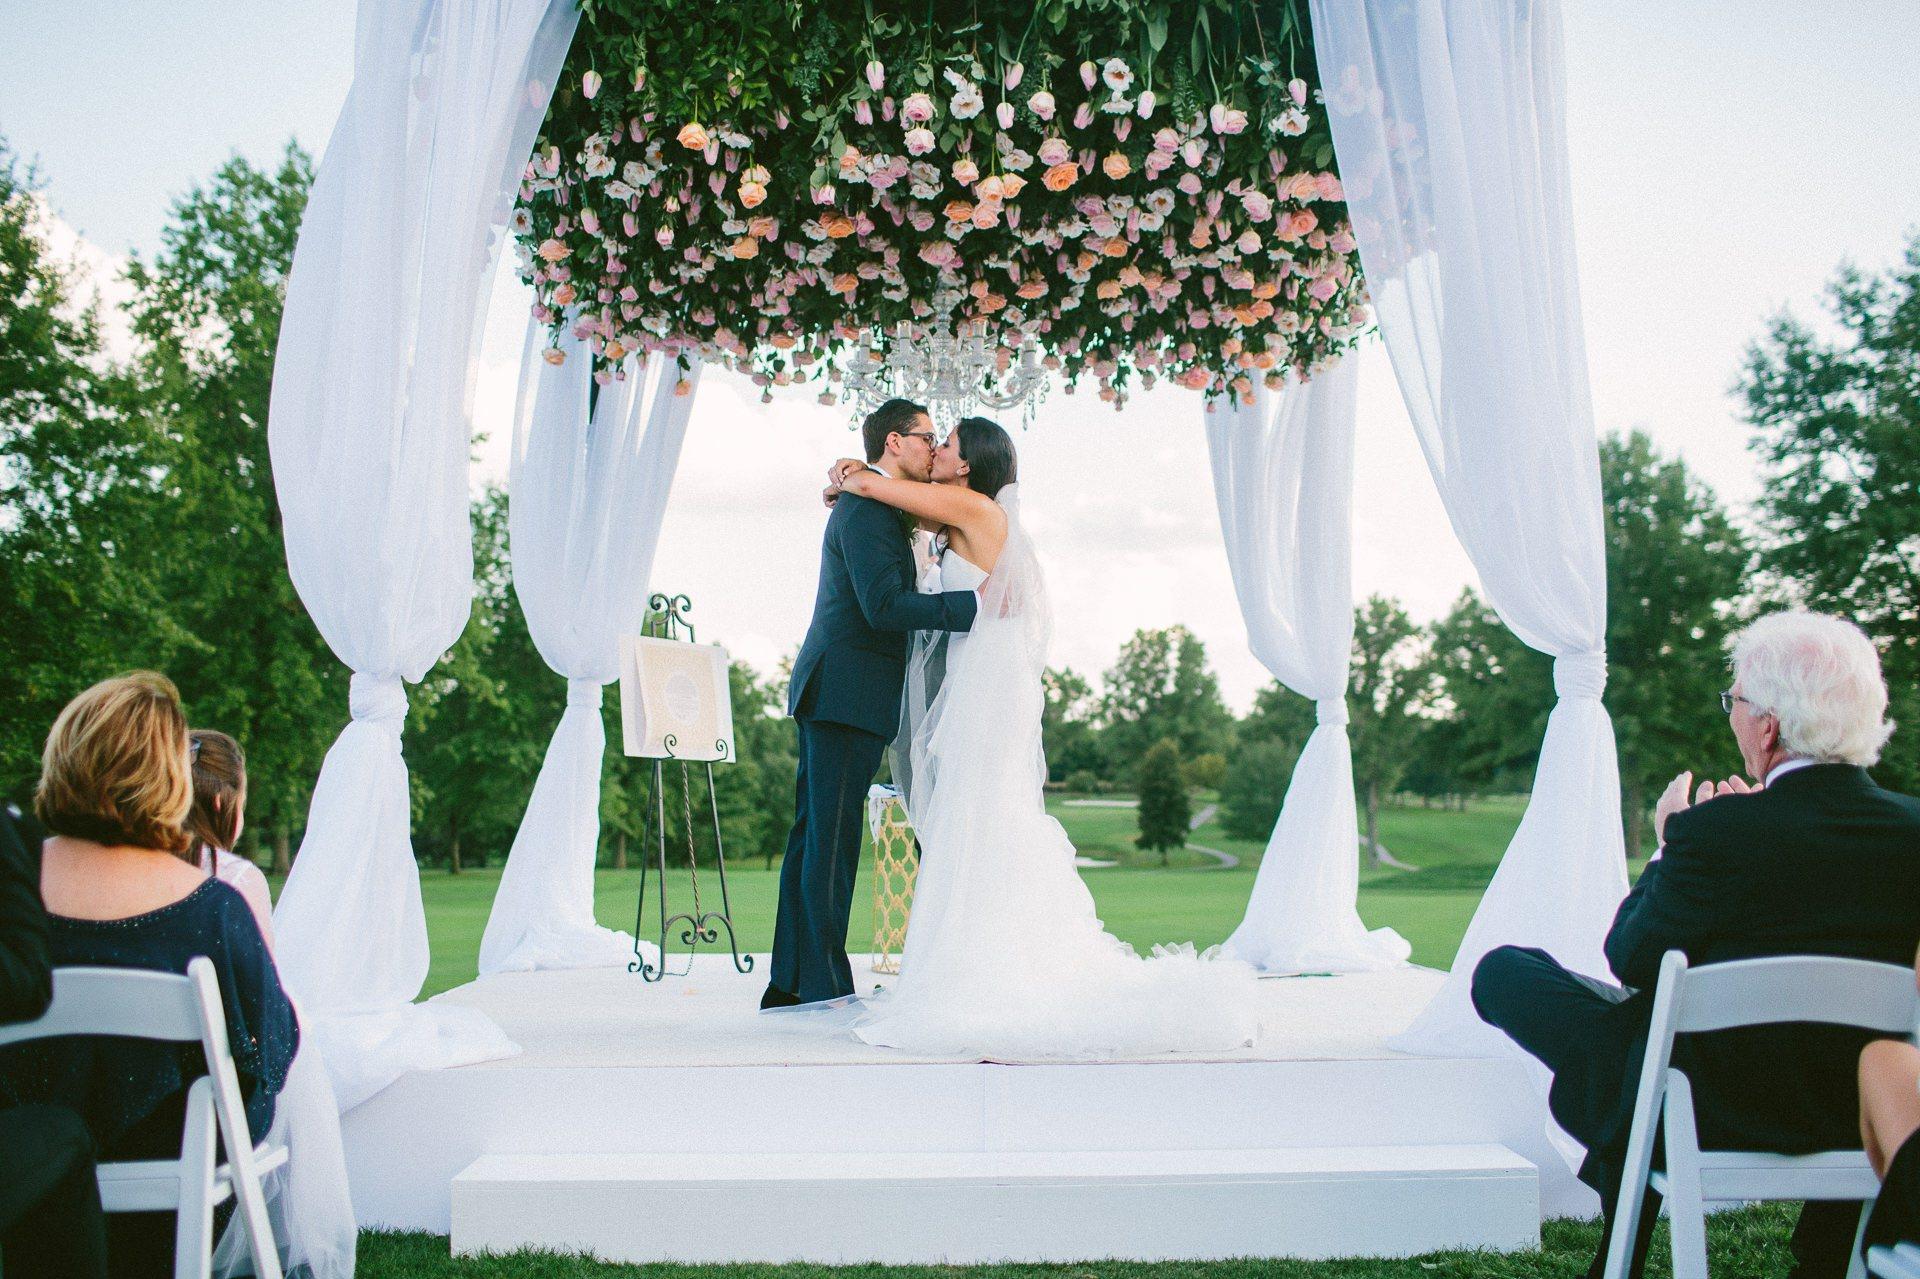 Beechmont Country Club Wedding Photographer in Beachwood 2 35.jpg